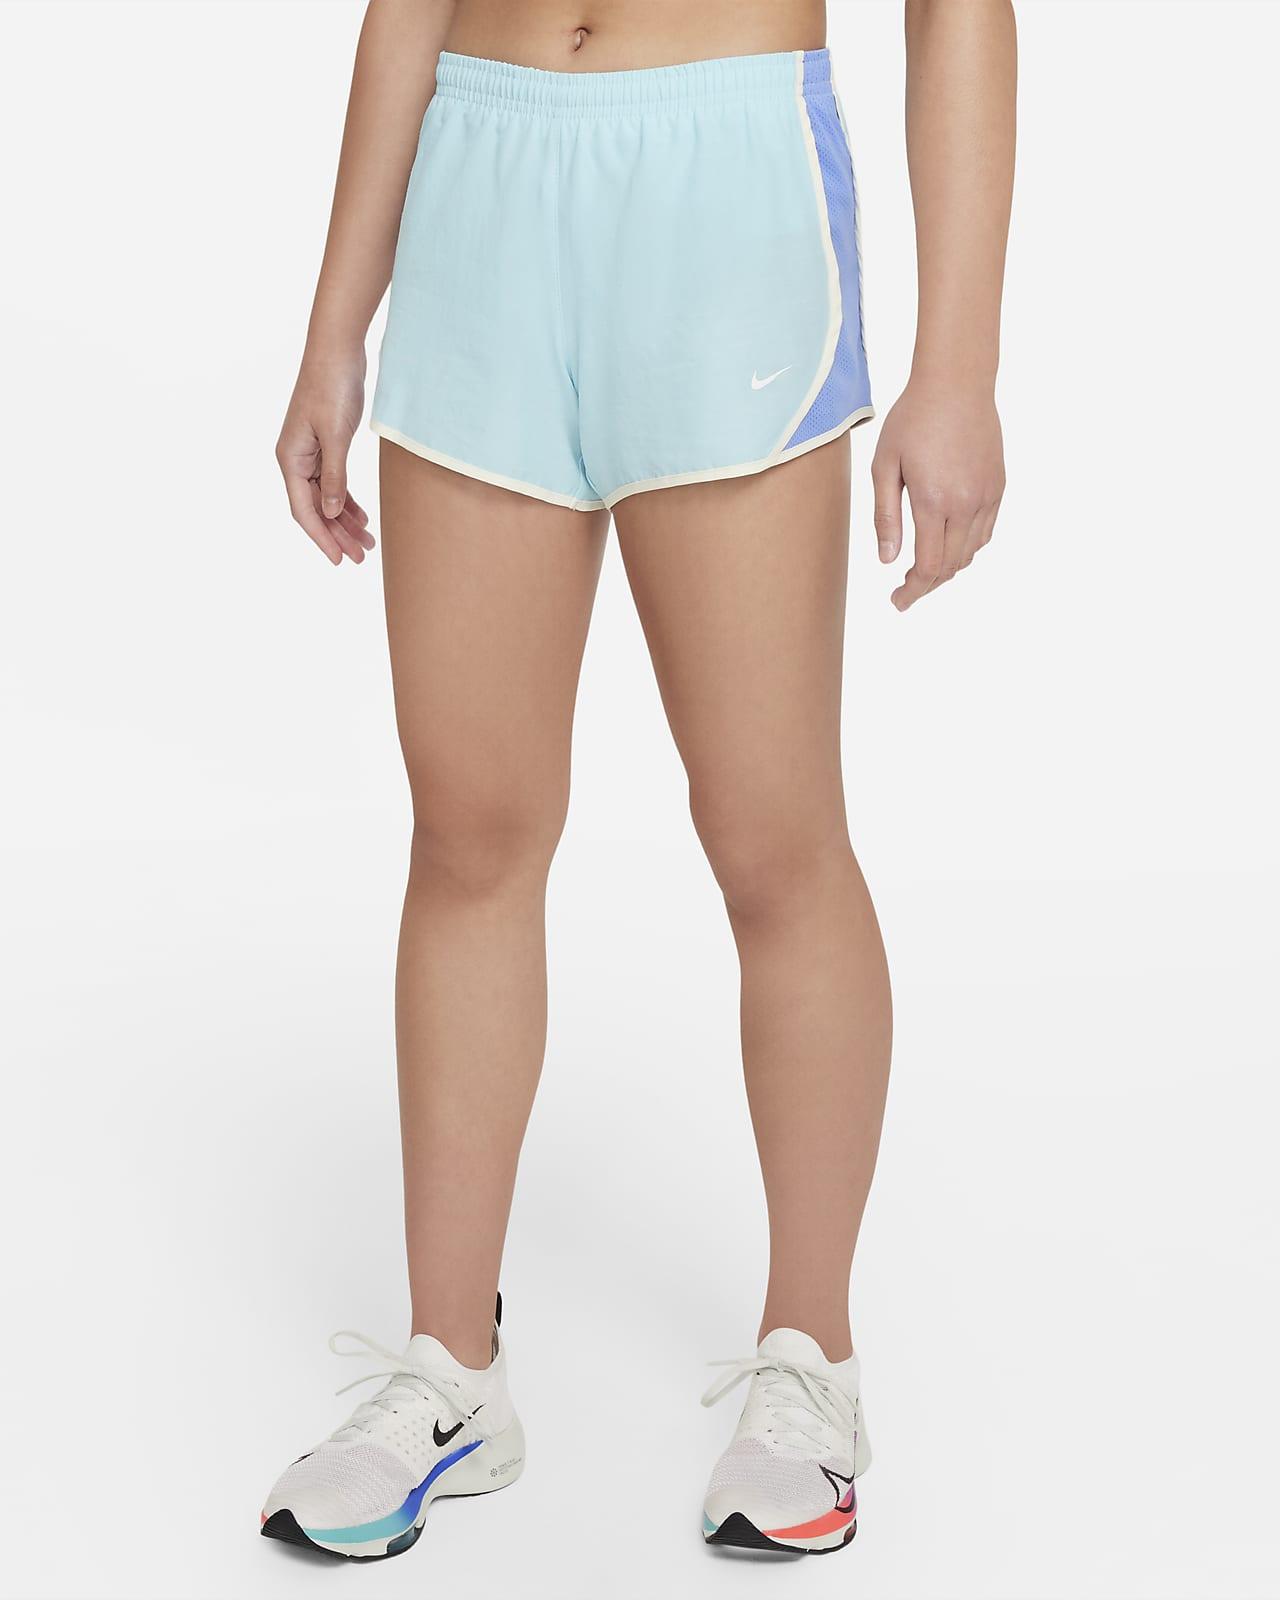 Nike Dri-FIT Tempo Big Kids' (Girls') Running Shorts